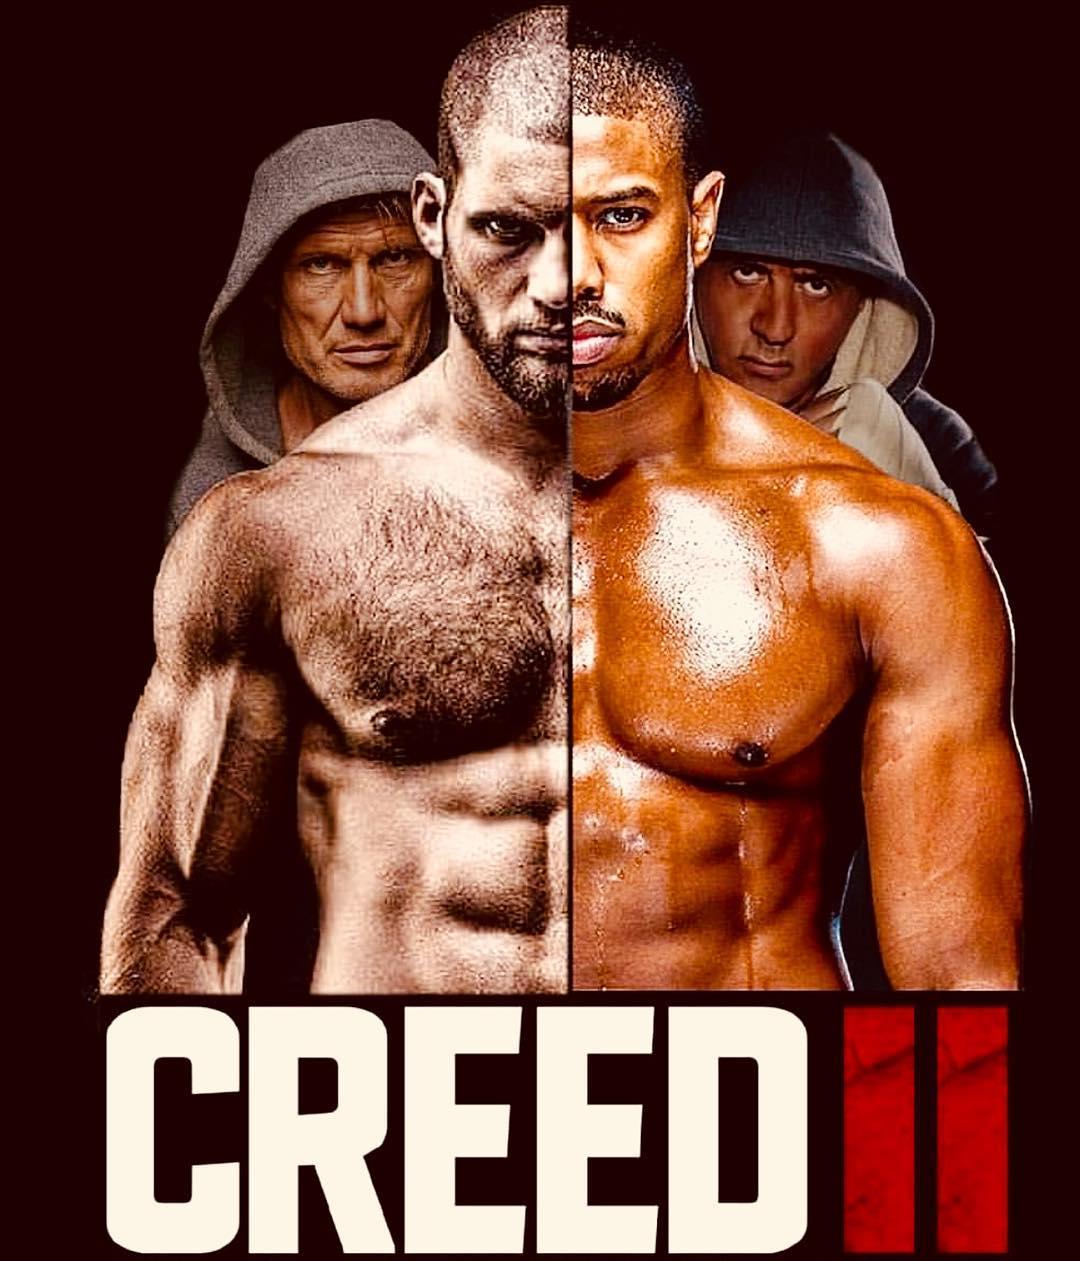 filmes-esperados-creed-ii